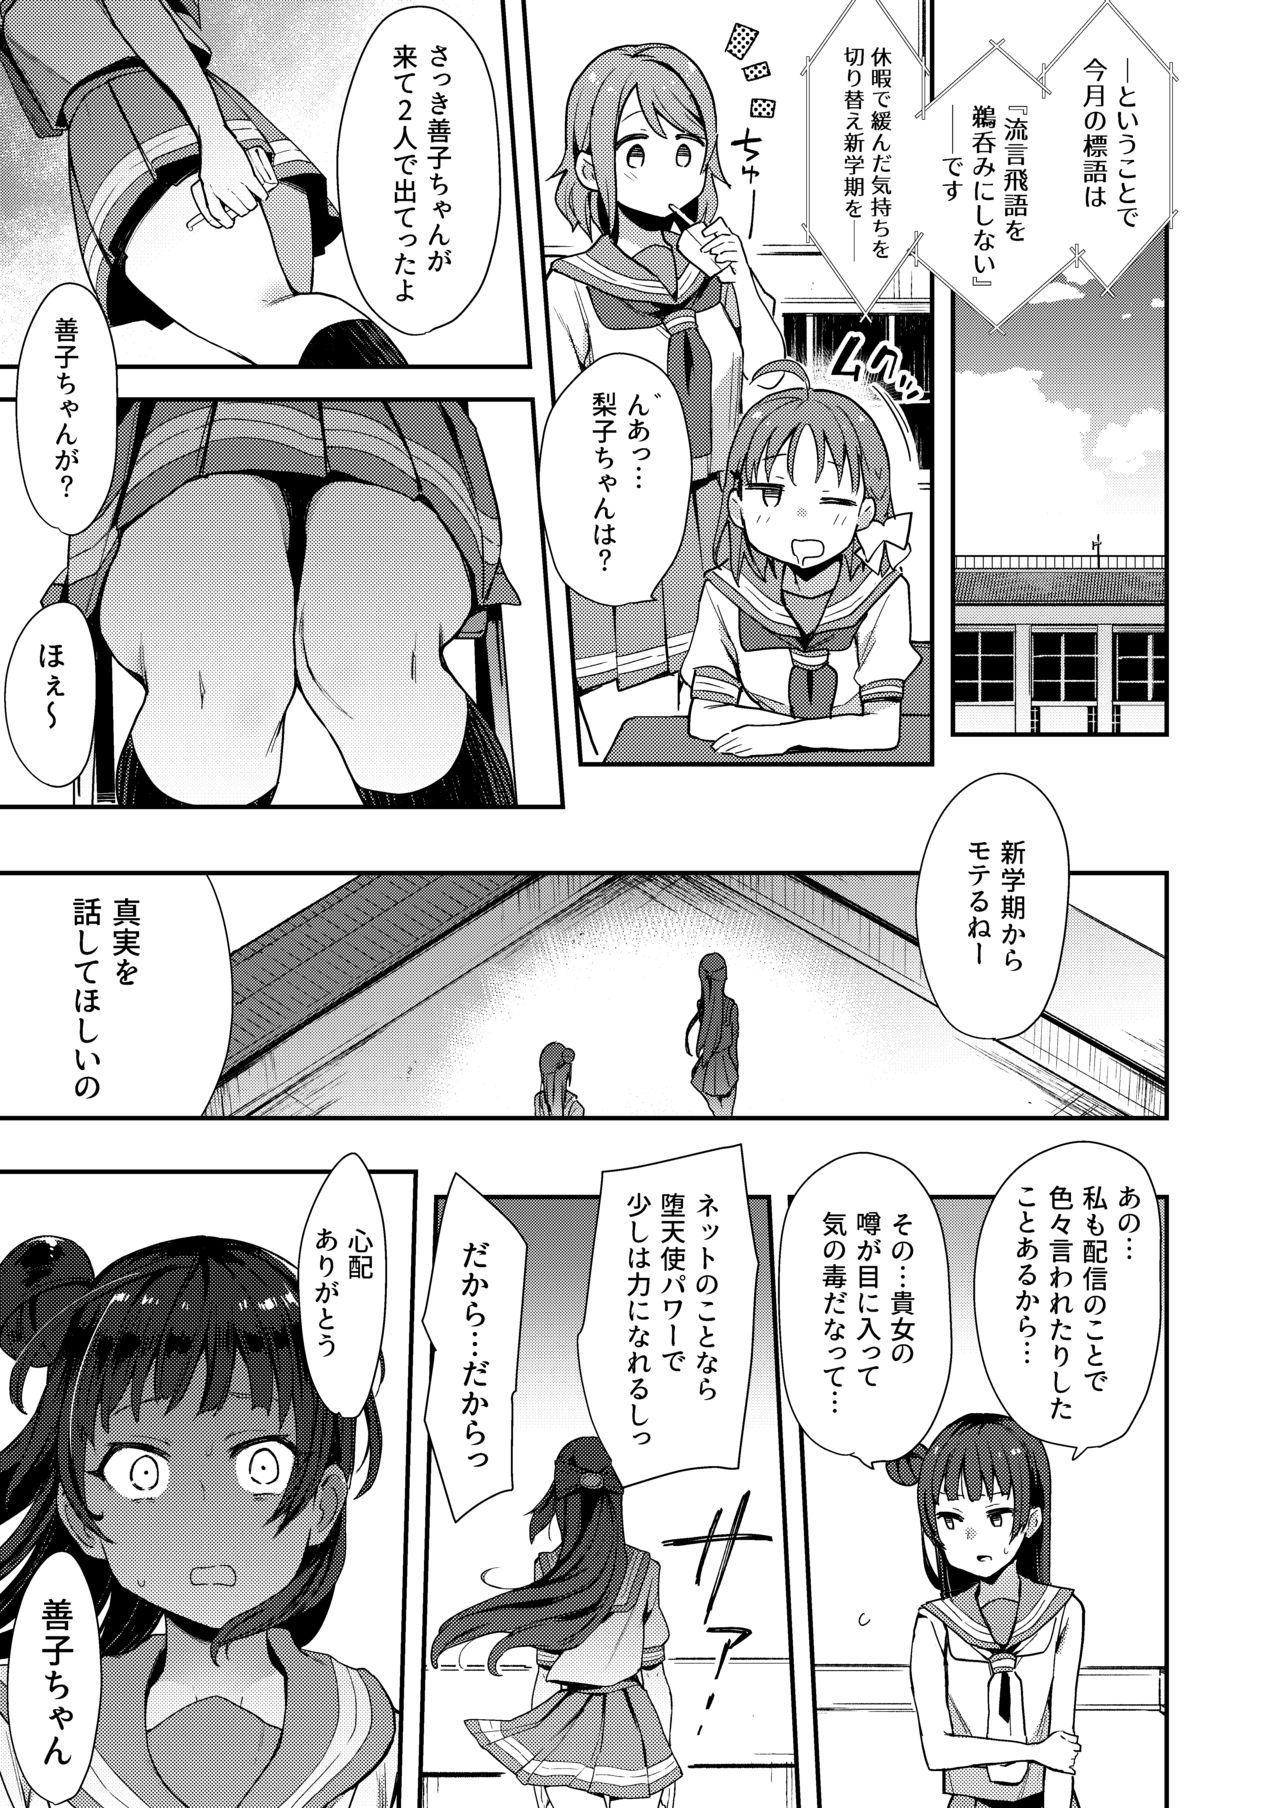 Ecchi Sketch Ro Ona Uchi. Soushuuhen 127